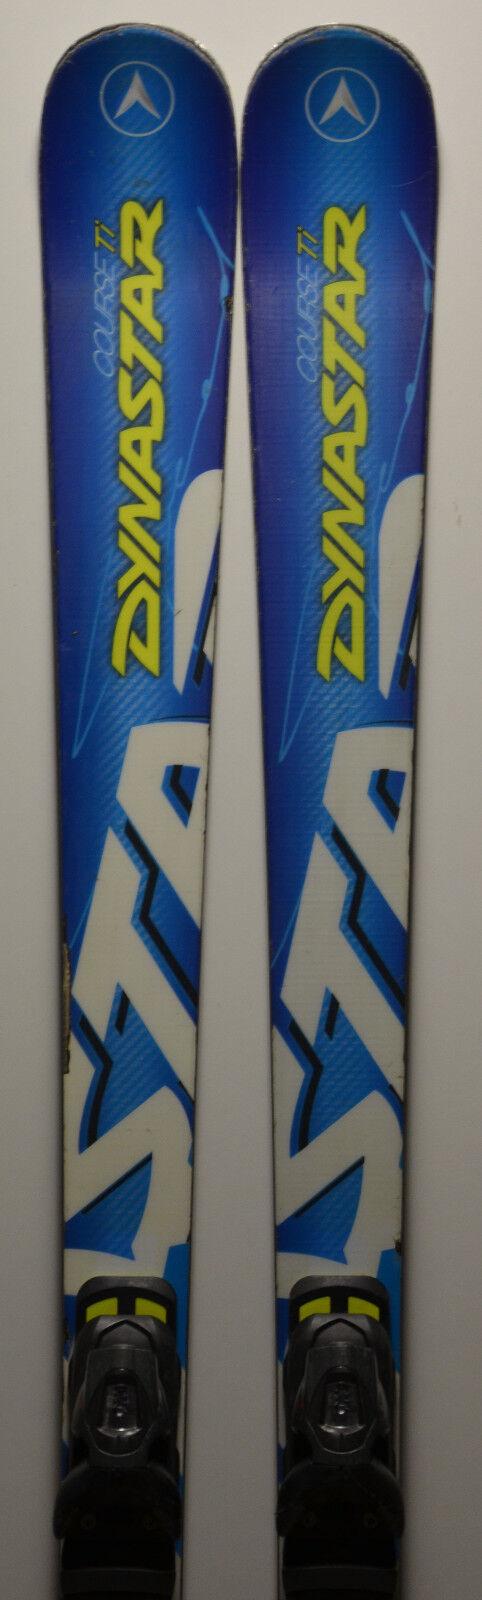 Esquí usado parabólico DYNAEstrella Speed Raza TI - 183cm